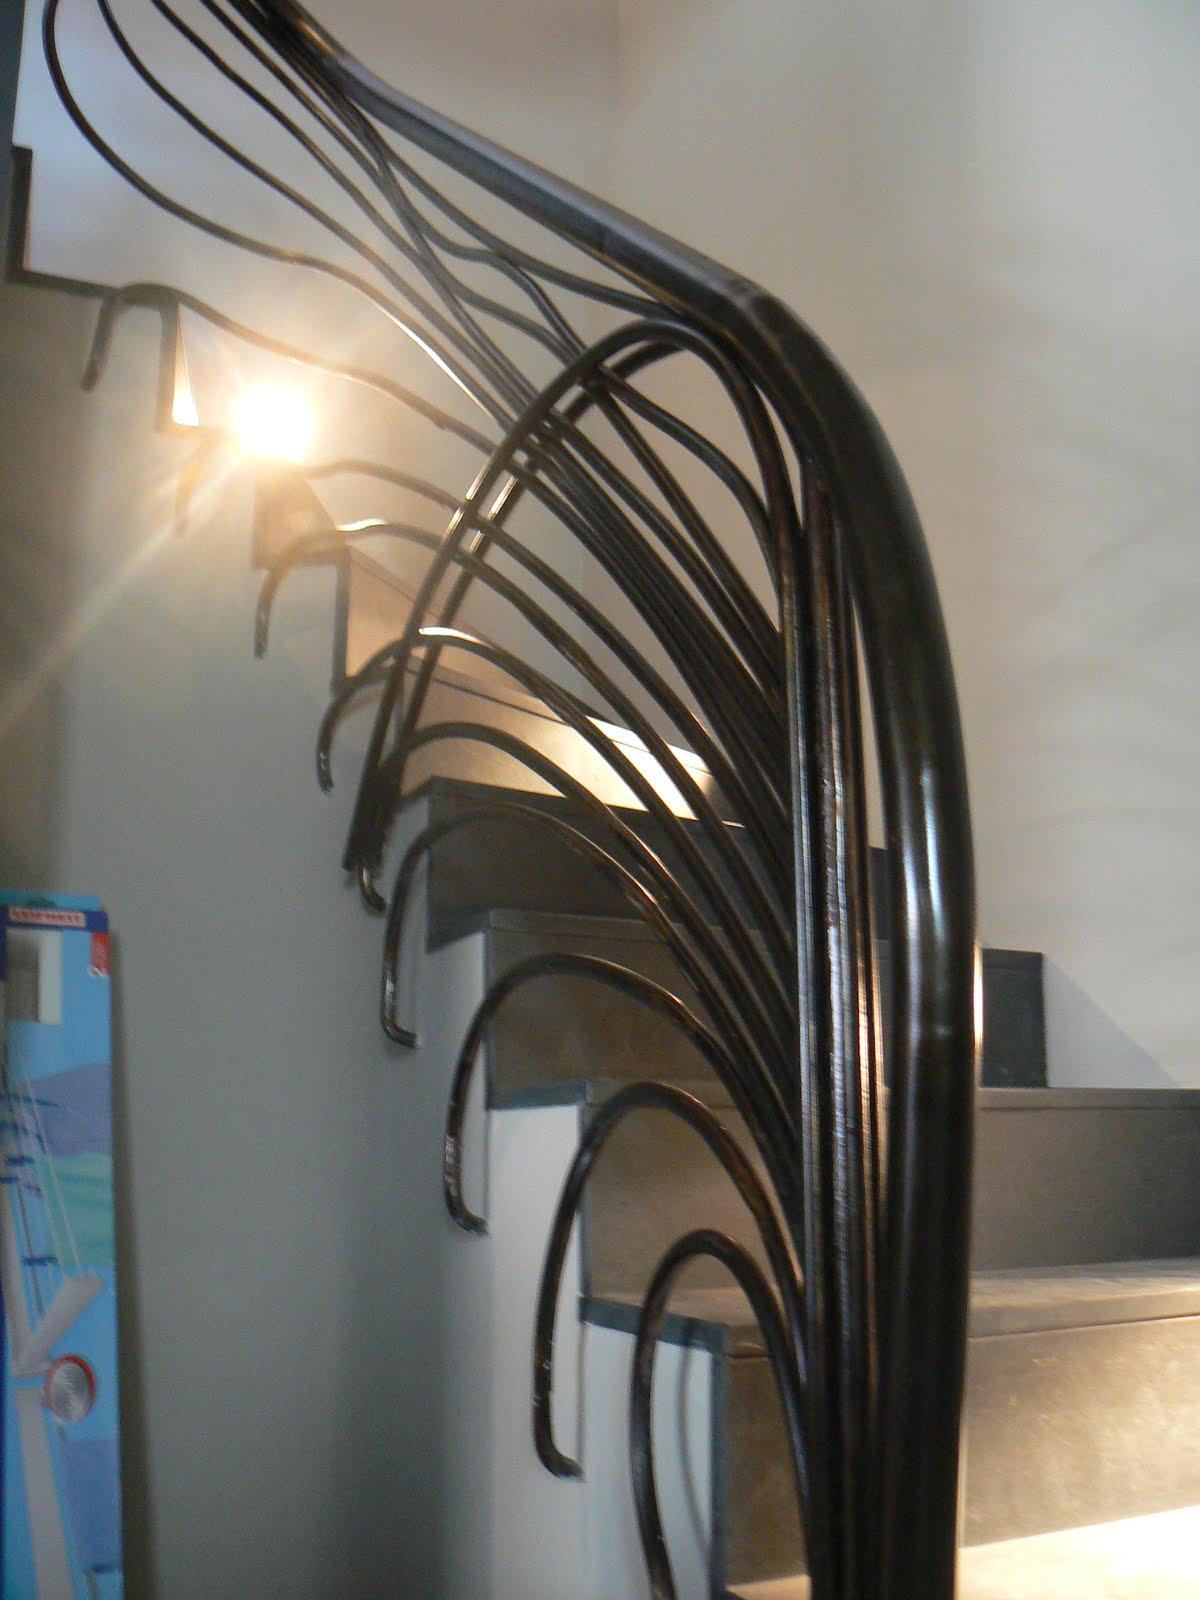 Herrer a barandilla escalera fernando de blasi - Barandilla de escalera ...